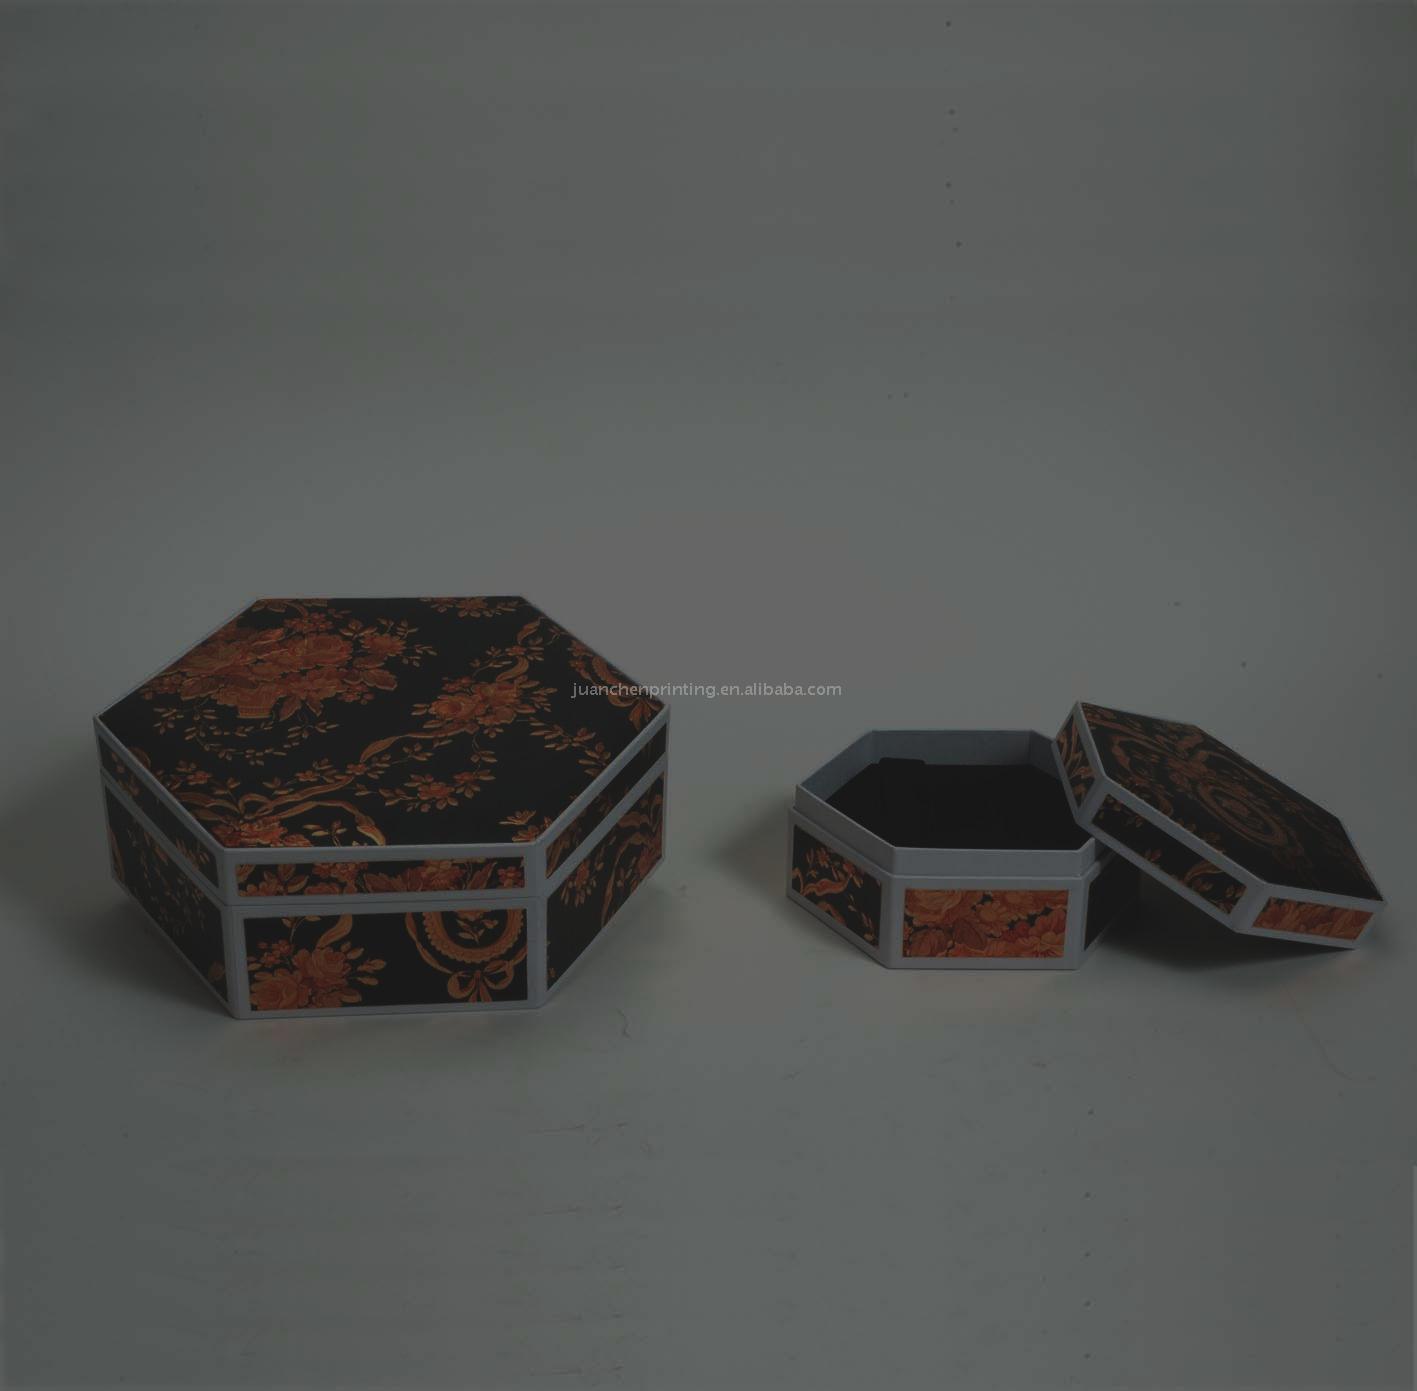 Jewellery Box (Ювелирные изделия Box)